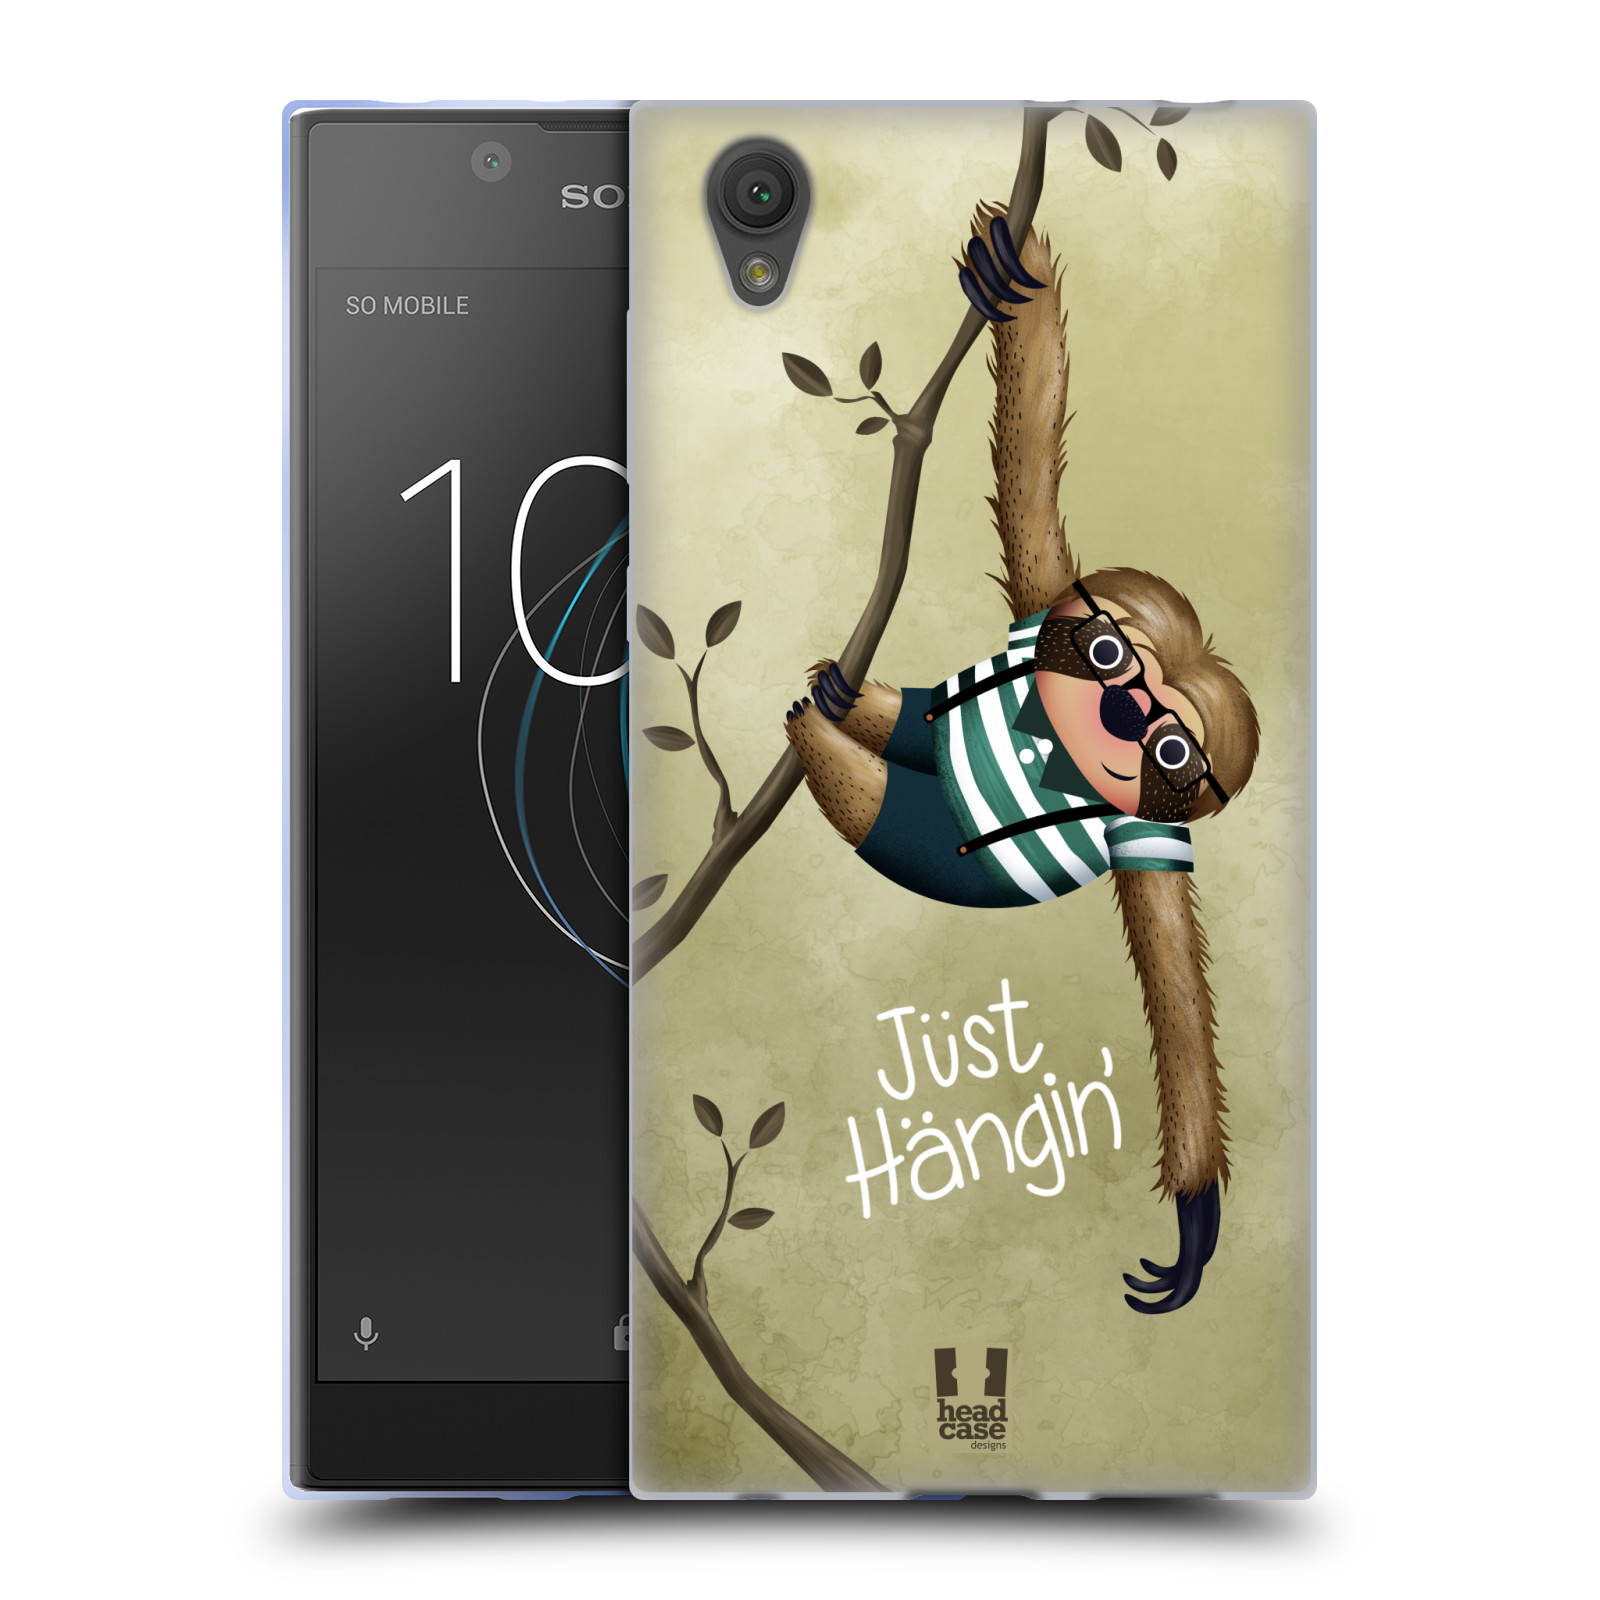 Silikonové pouzdro na mobil Sony Xperia L1 - Head Case - Lenochod Just Hangin